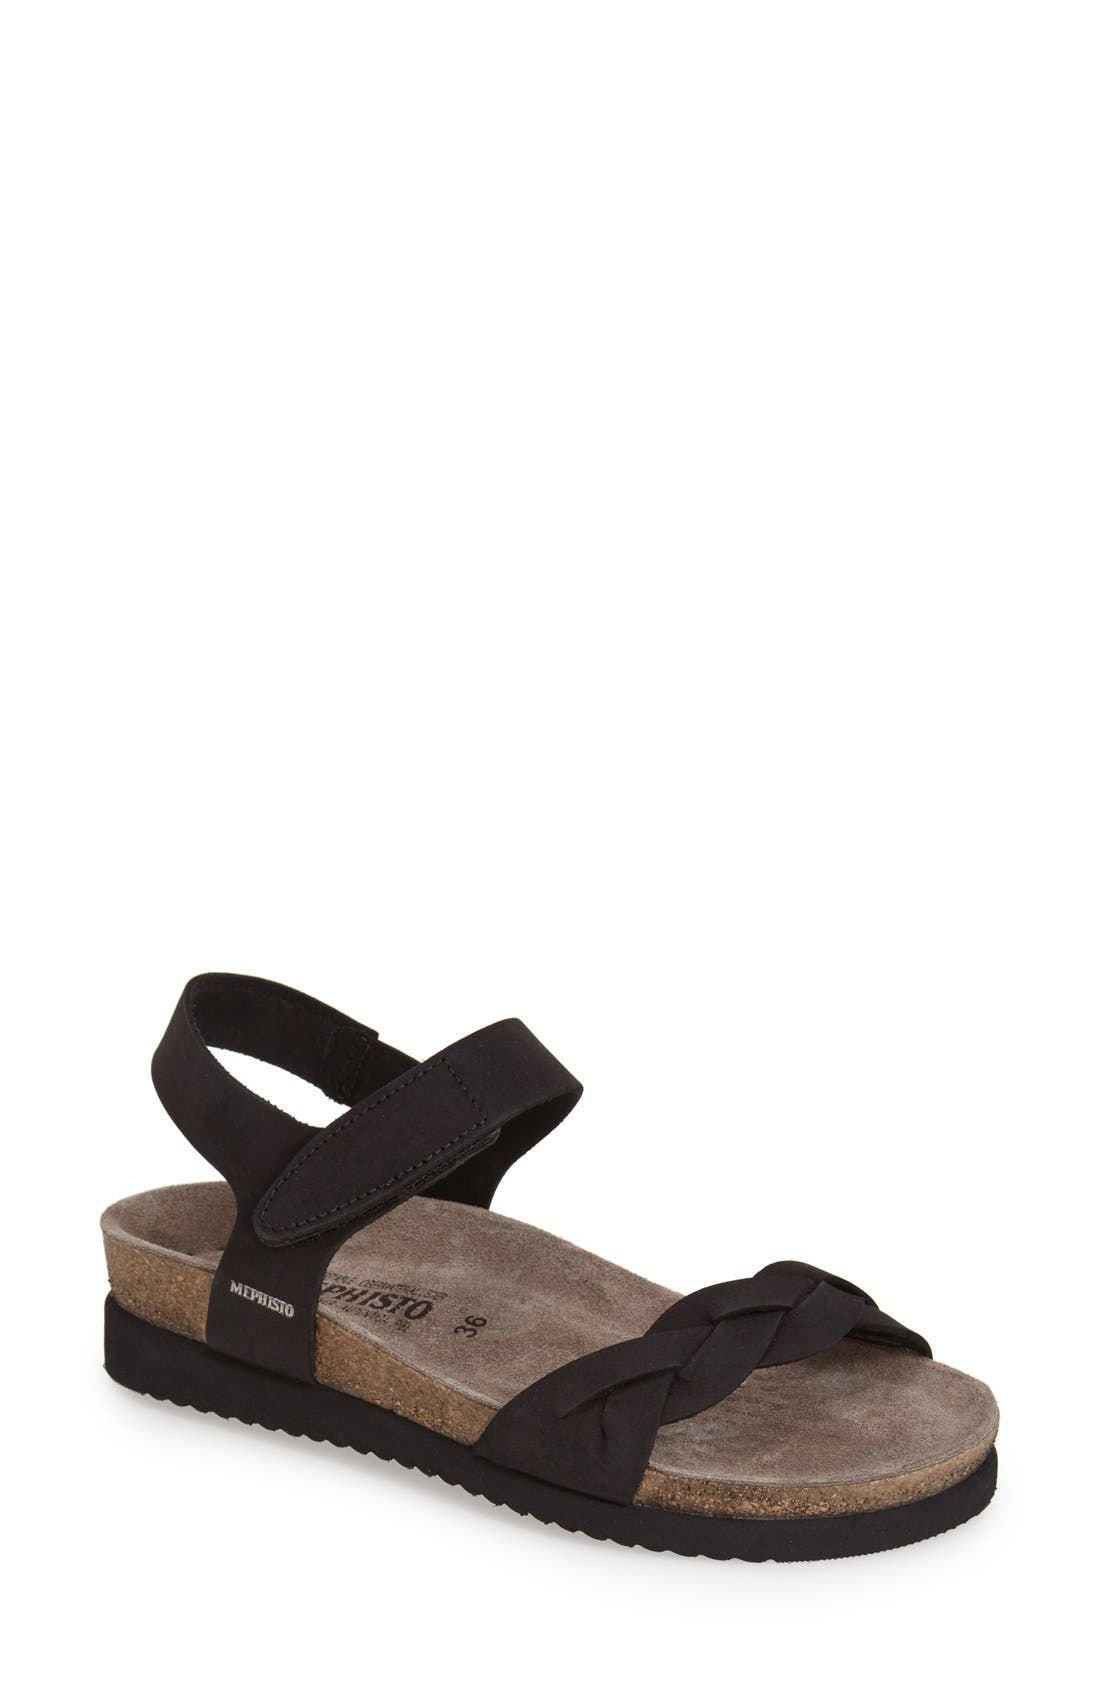 Main Image - Mephisto 'Honoria' Nubuck Leather Sandal (Women)